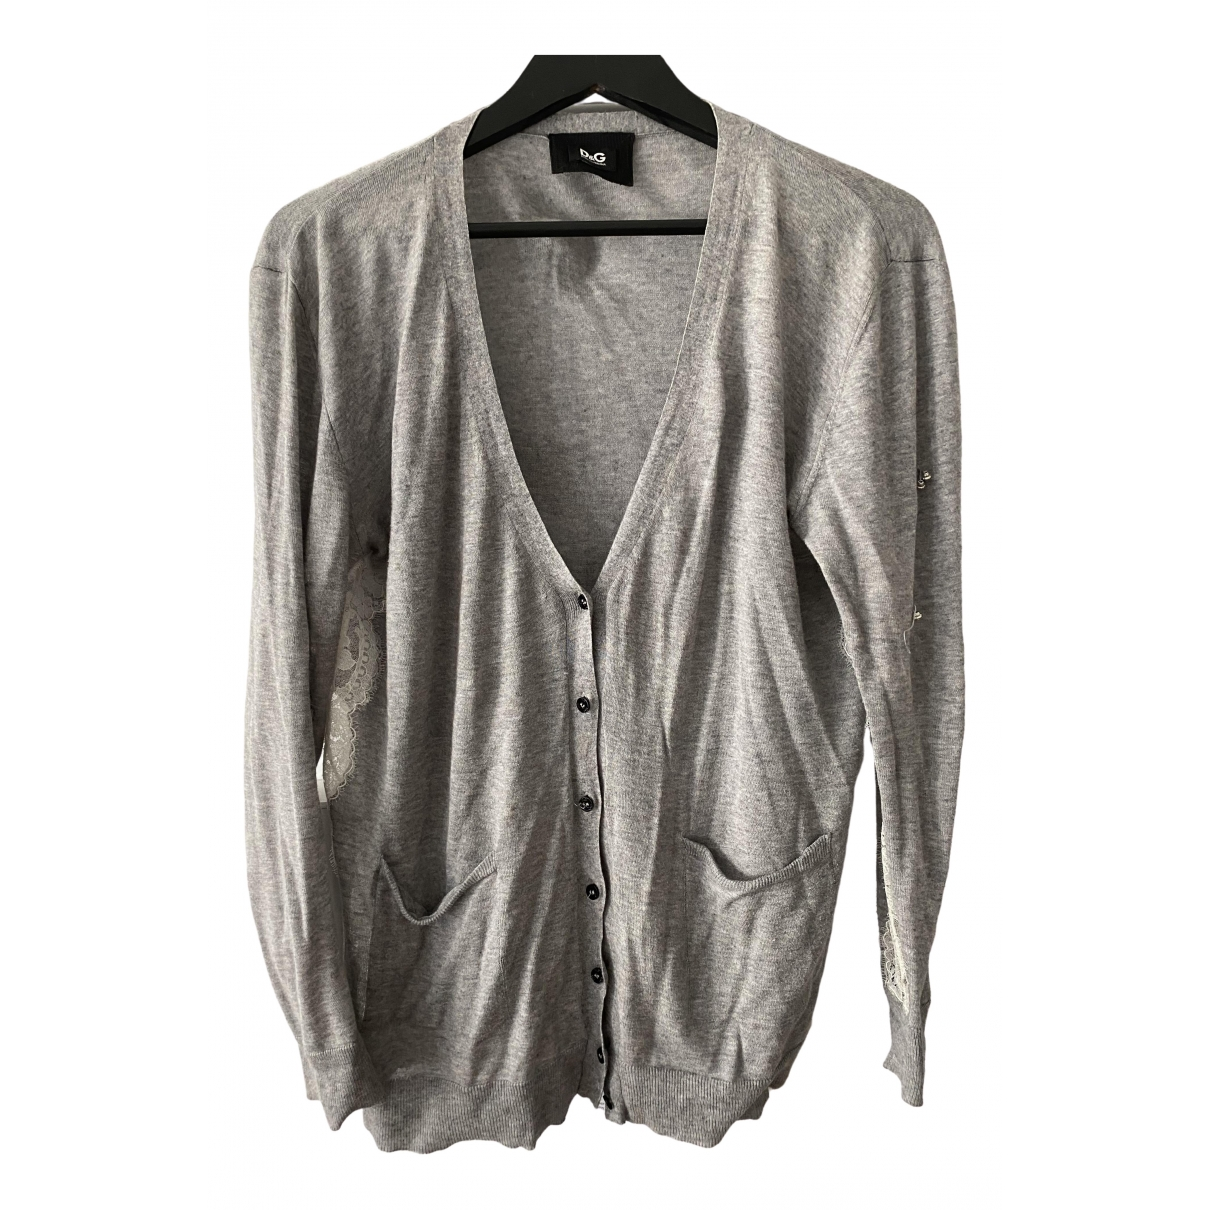 D&g \N Pullover in  Grau Wolle